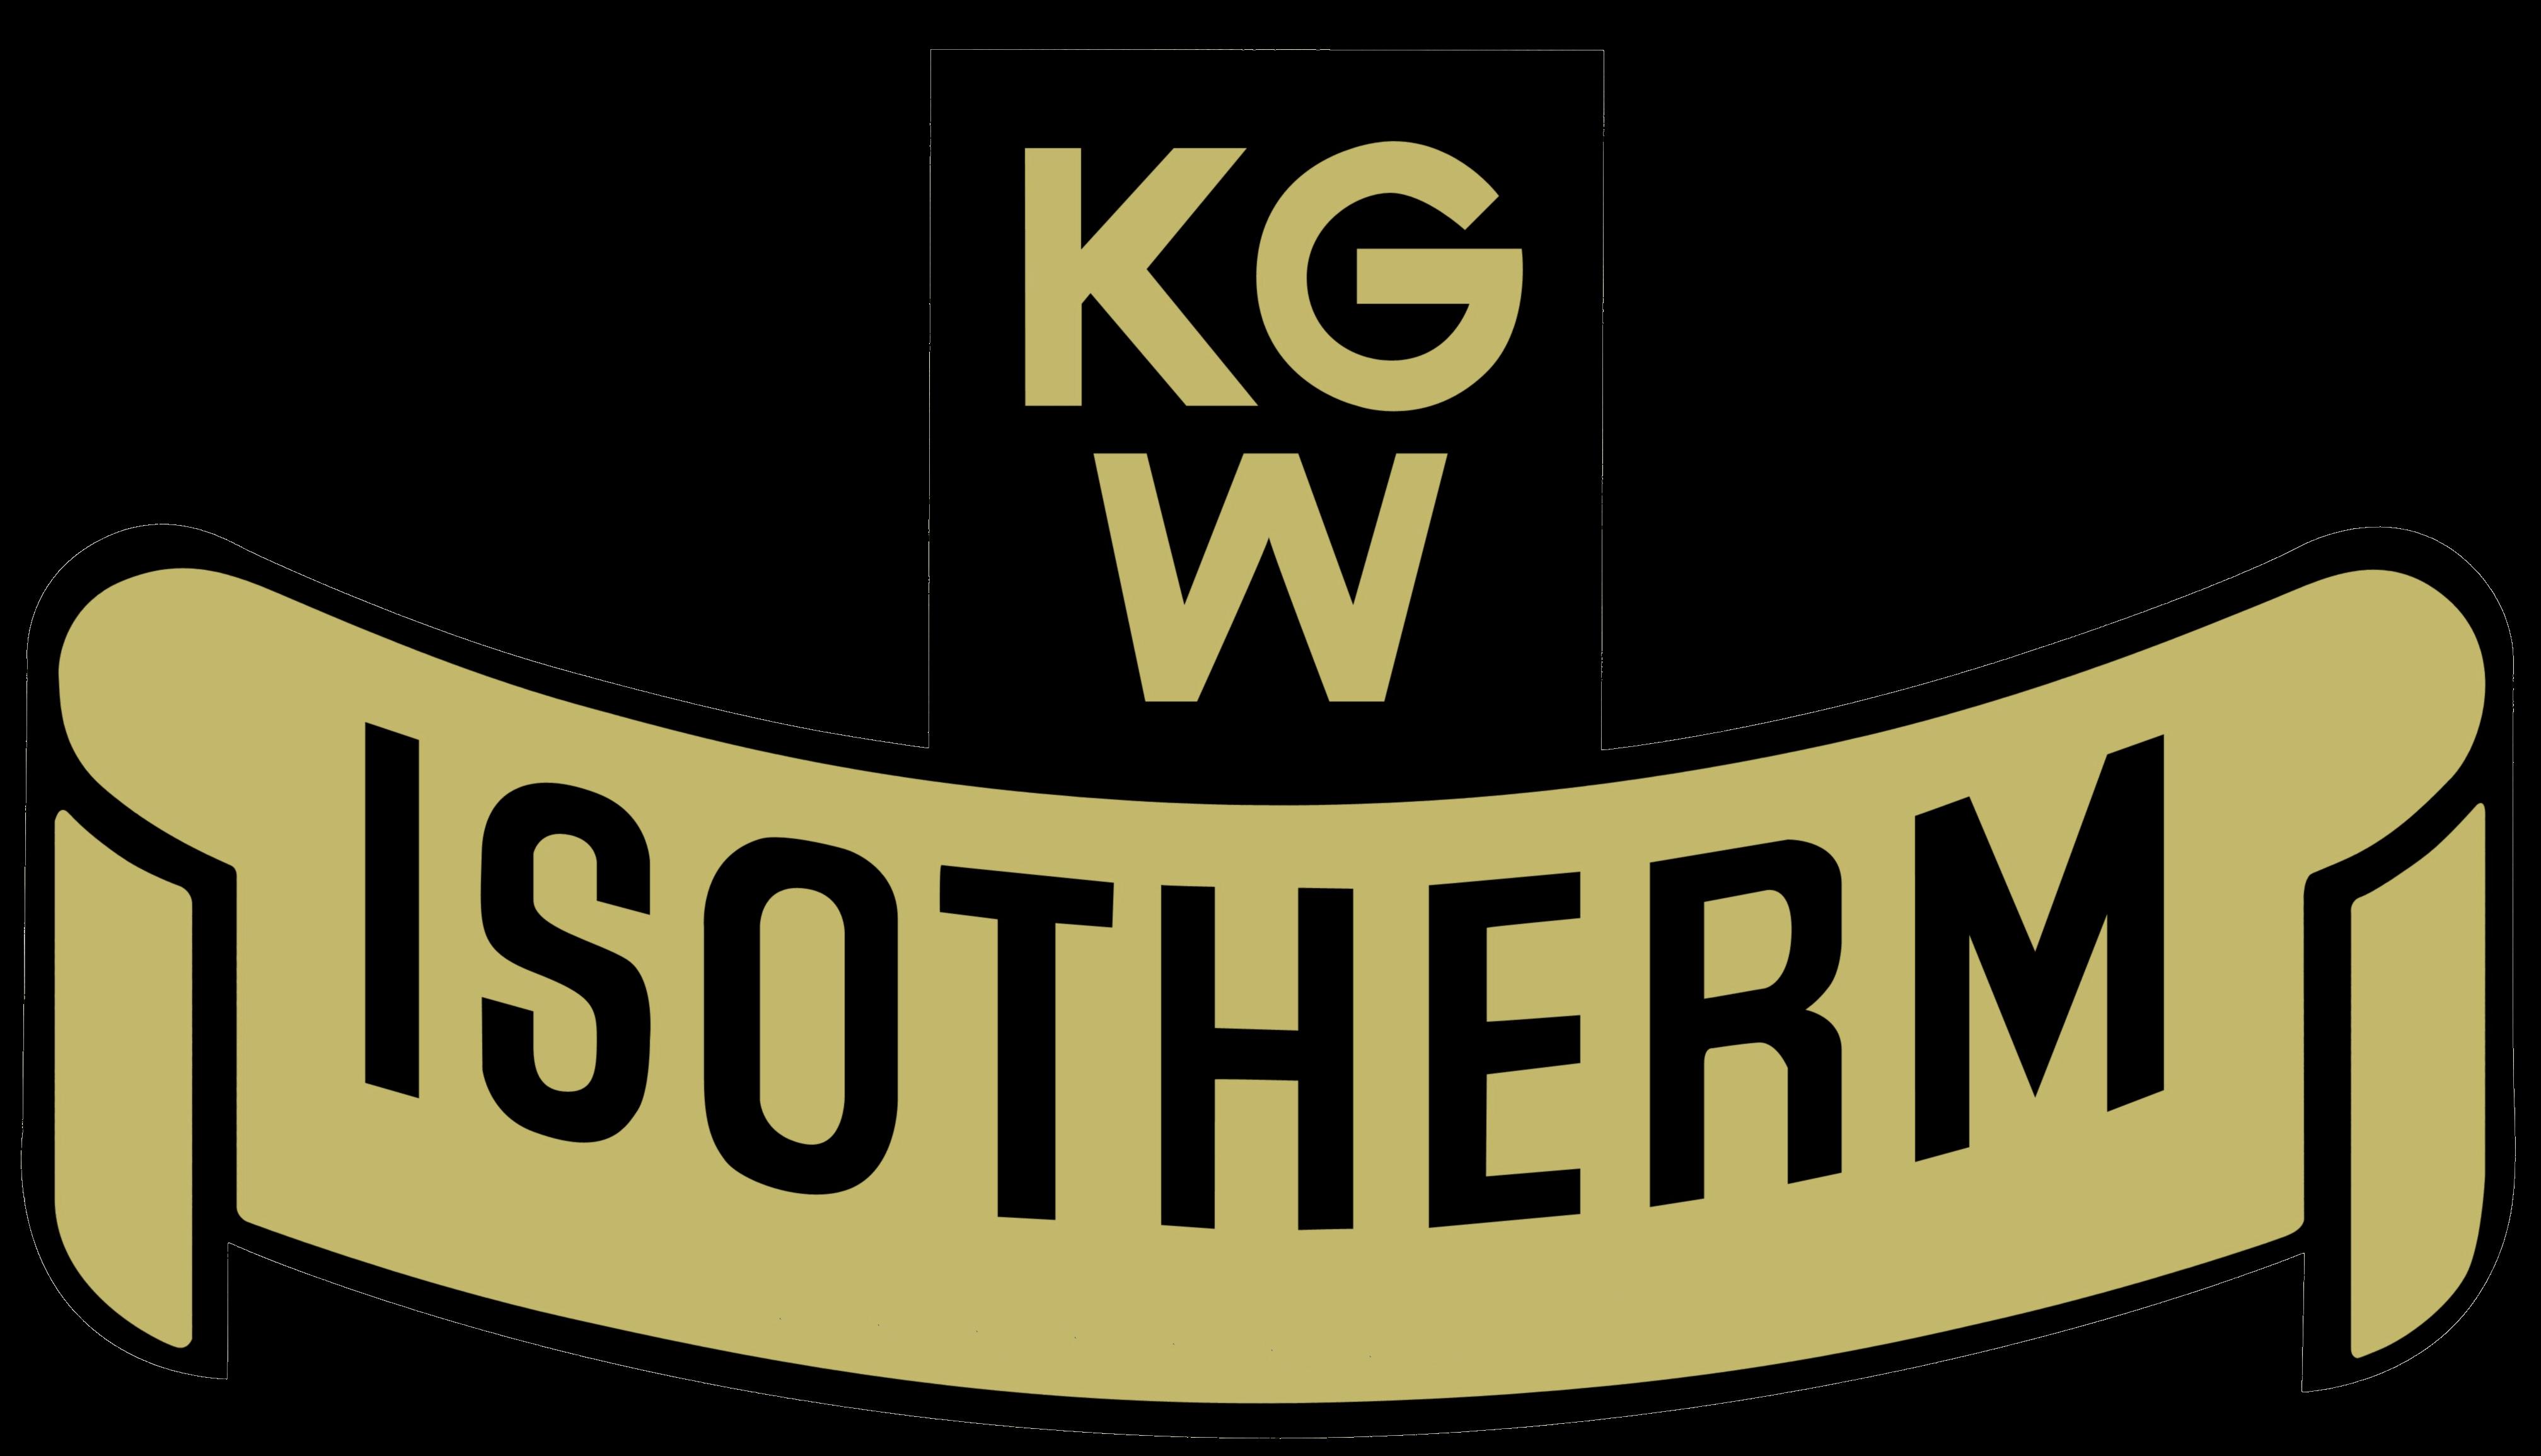 Isotherm-Logo_transparent-noBorder-min